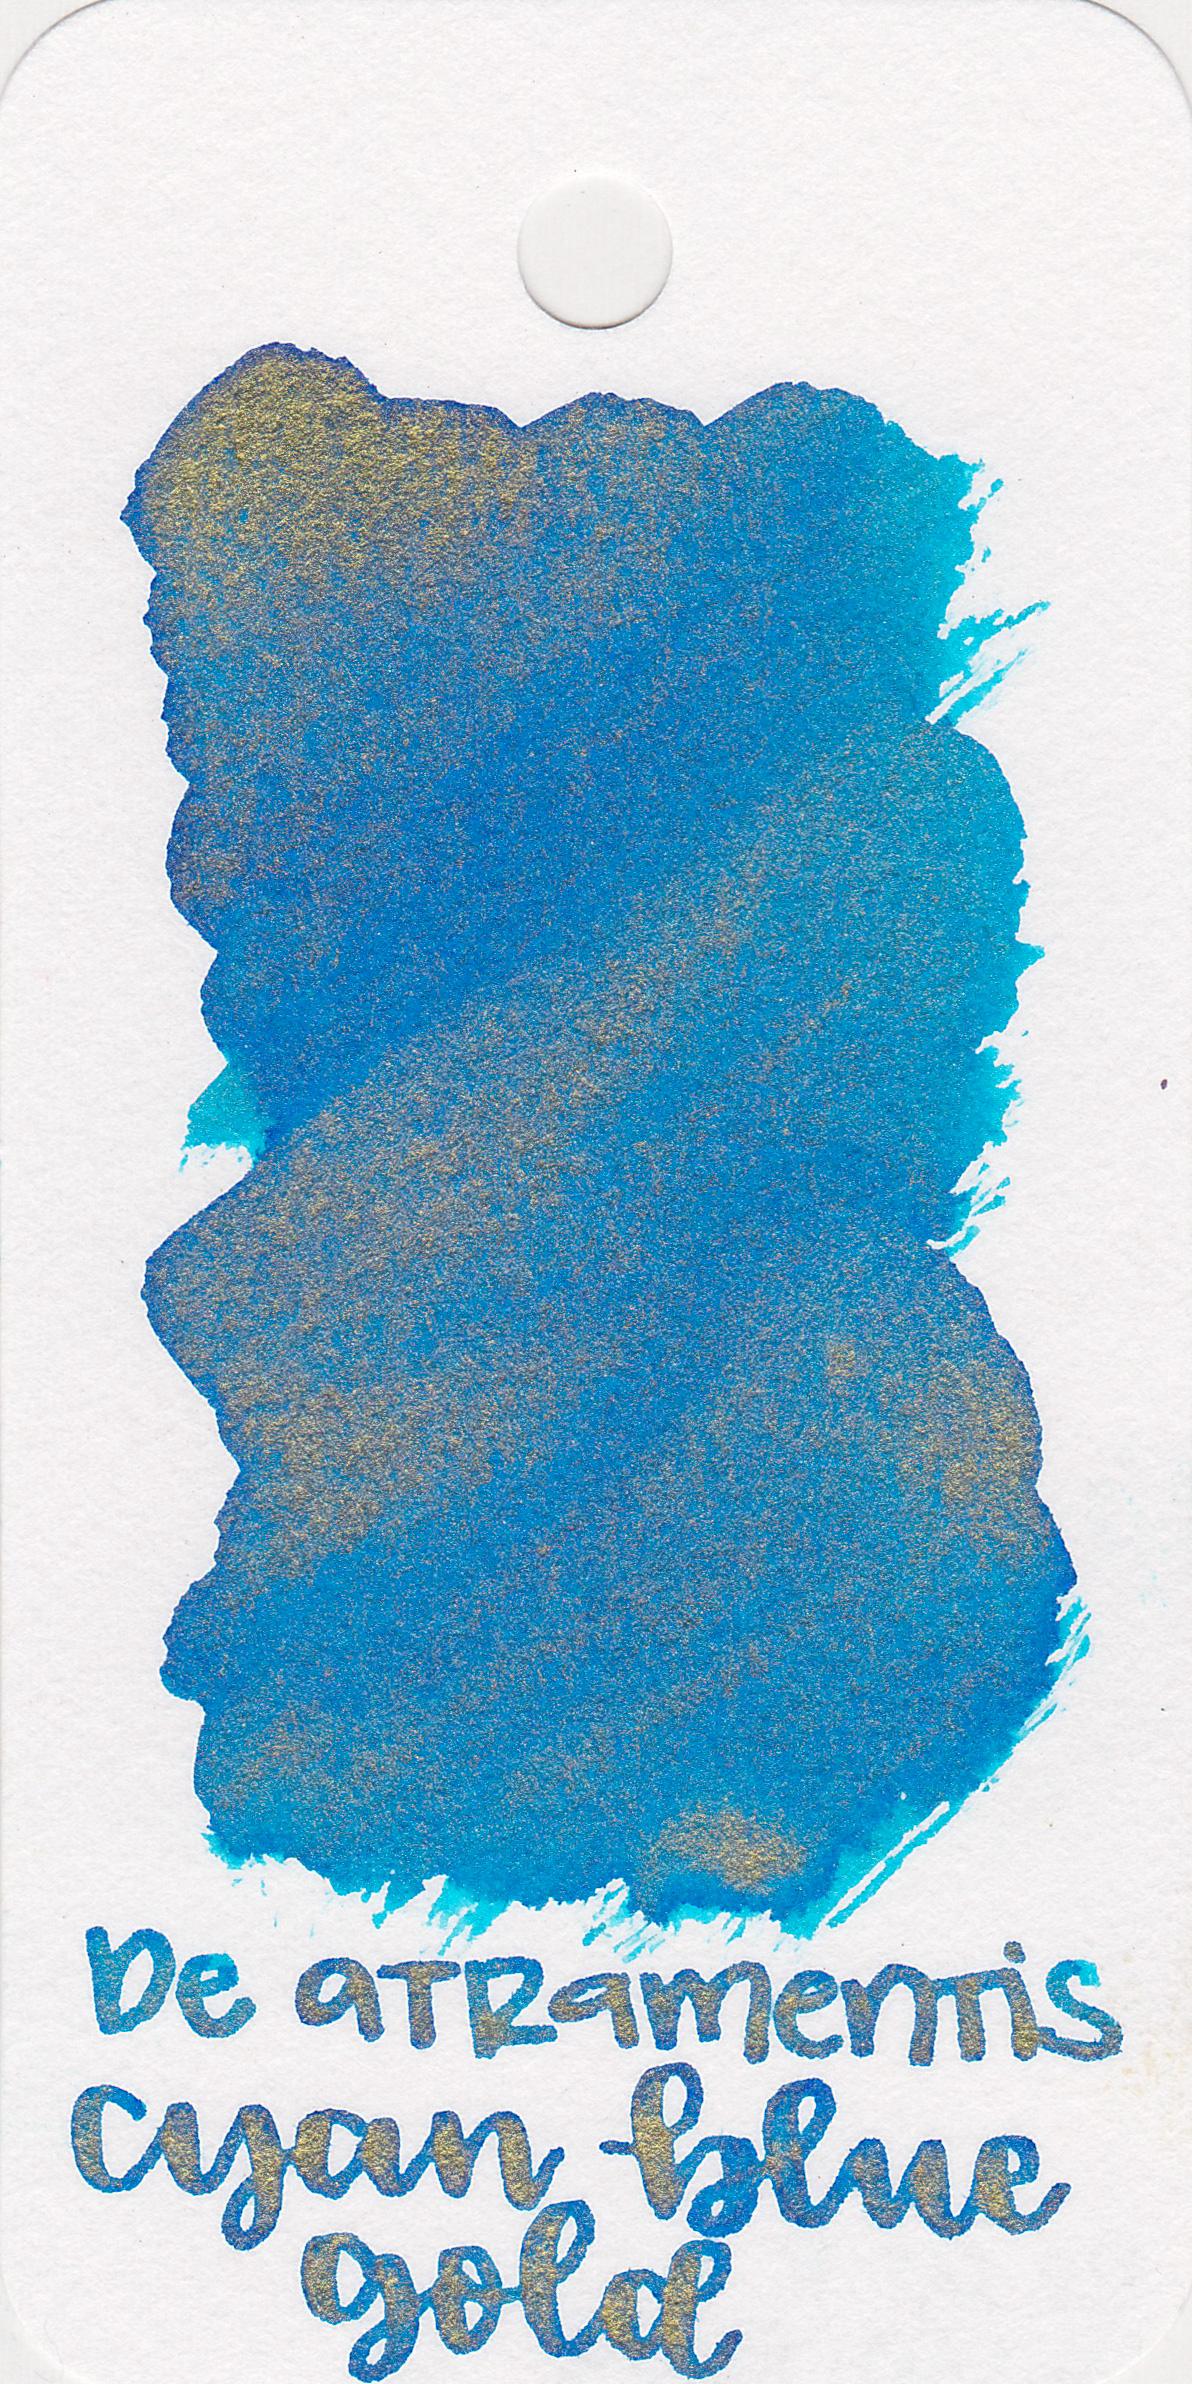 da-cyan-blue-1.jpg